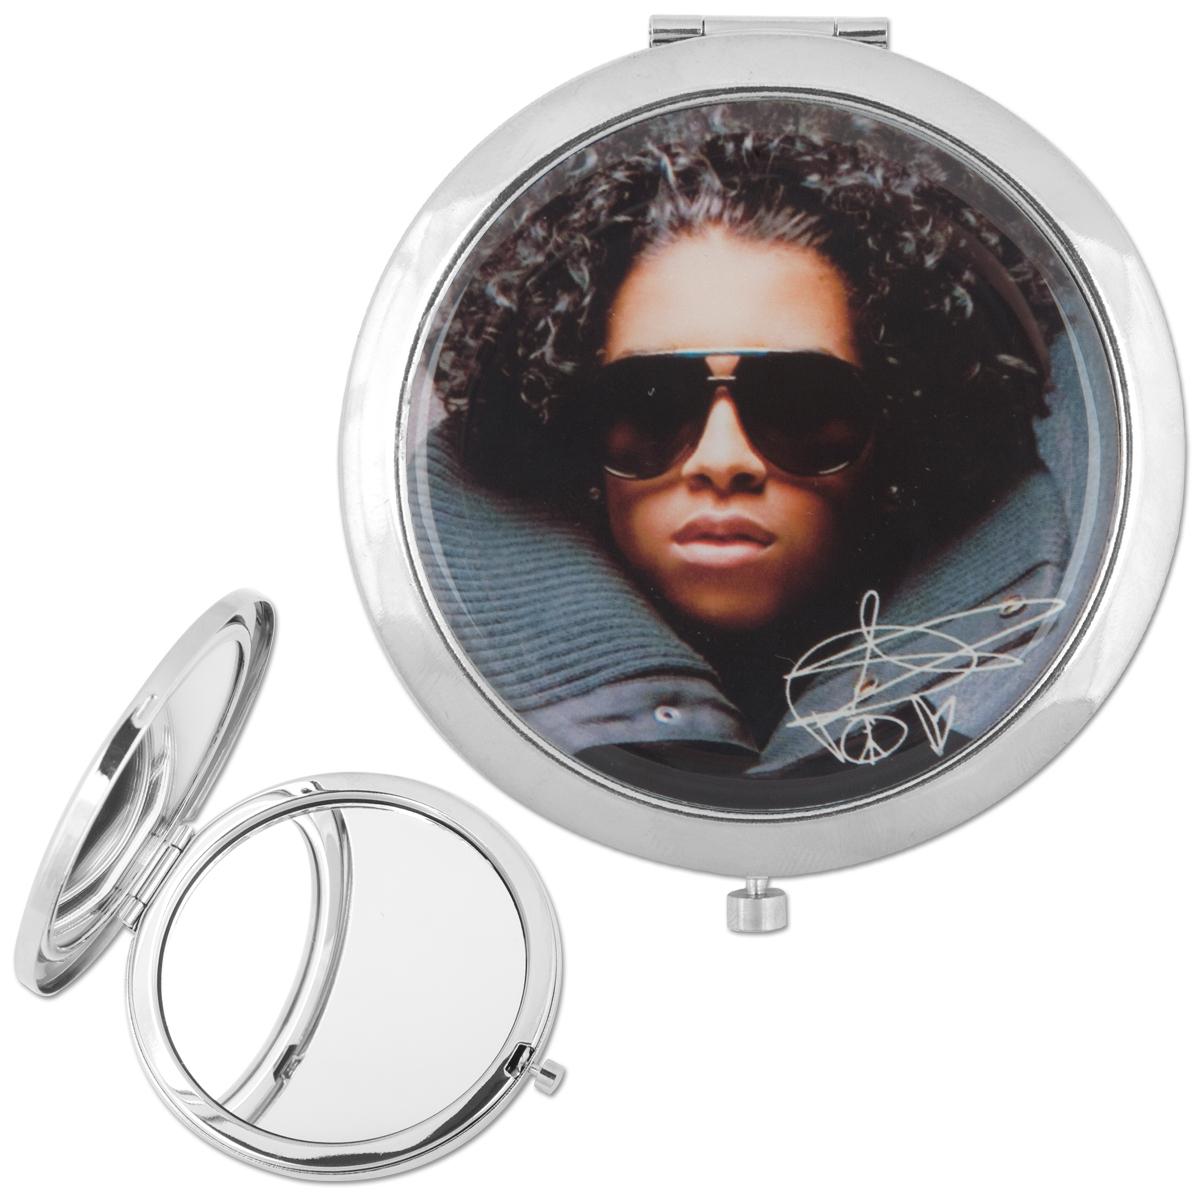 Mindless Behavior Princeton Mirror Compact